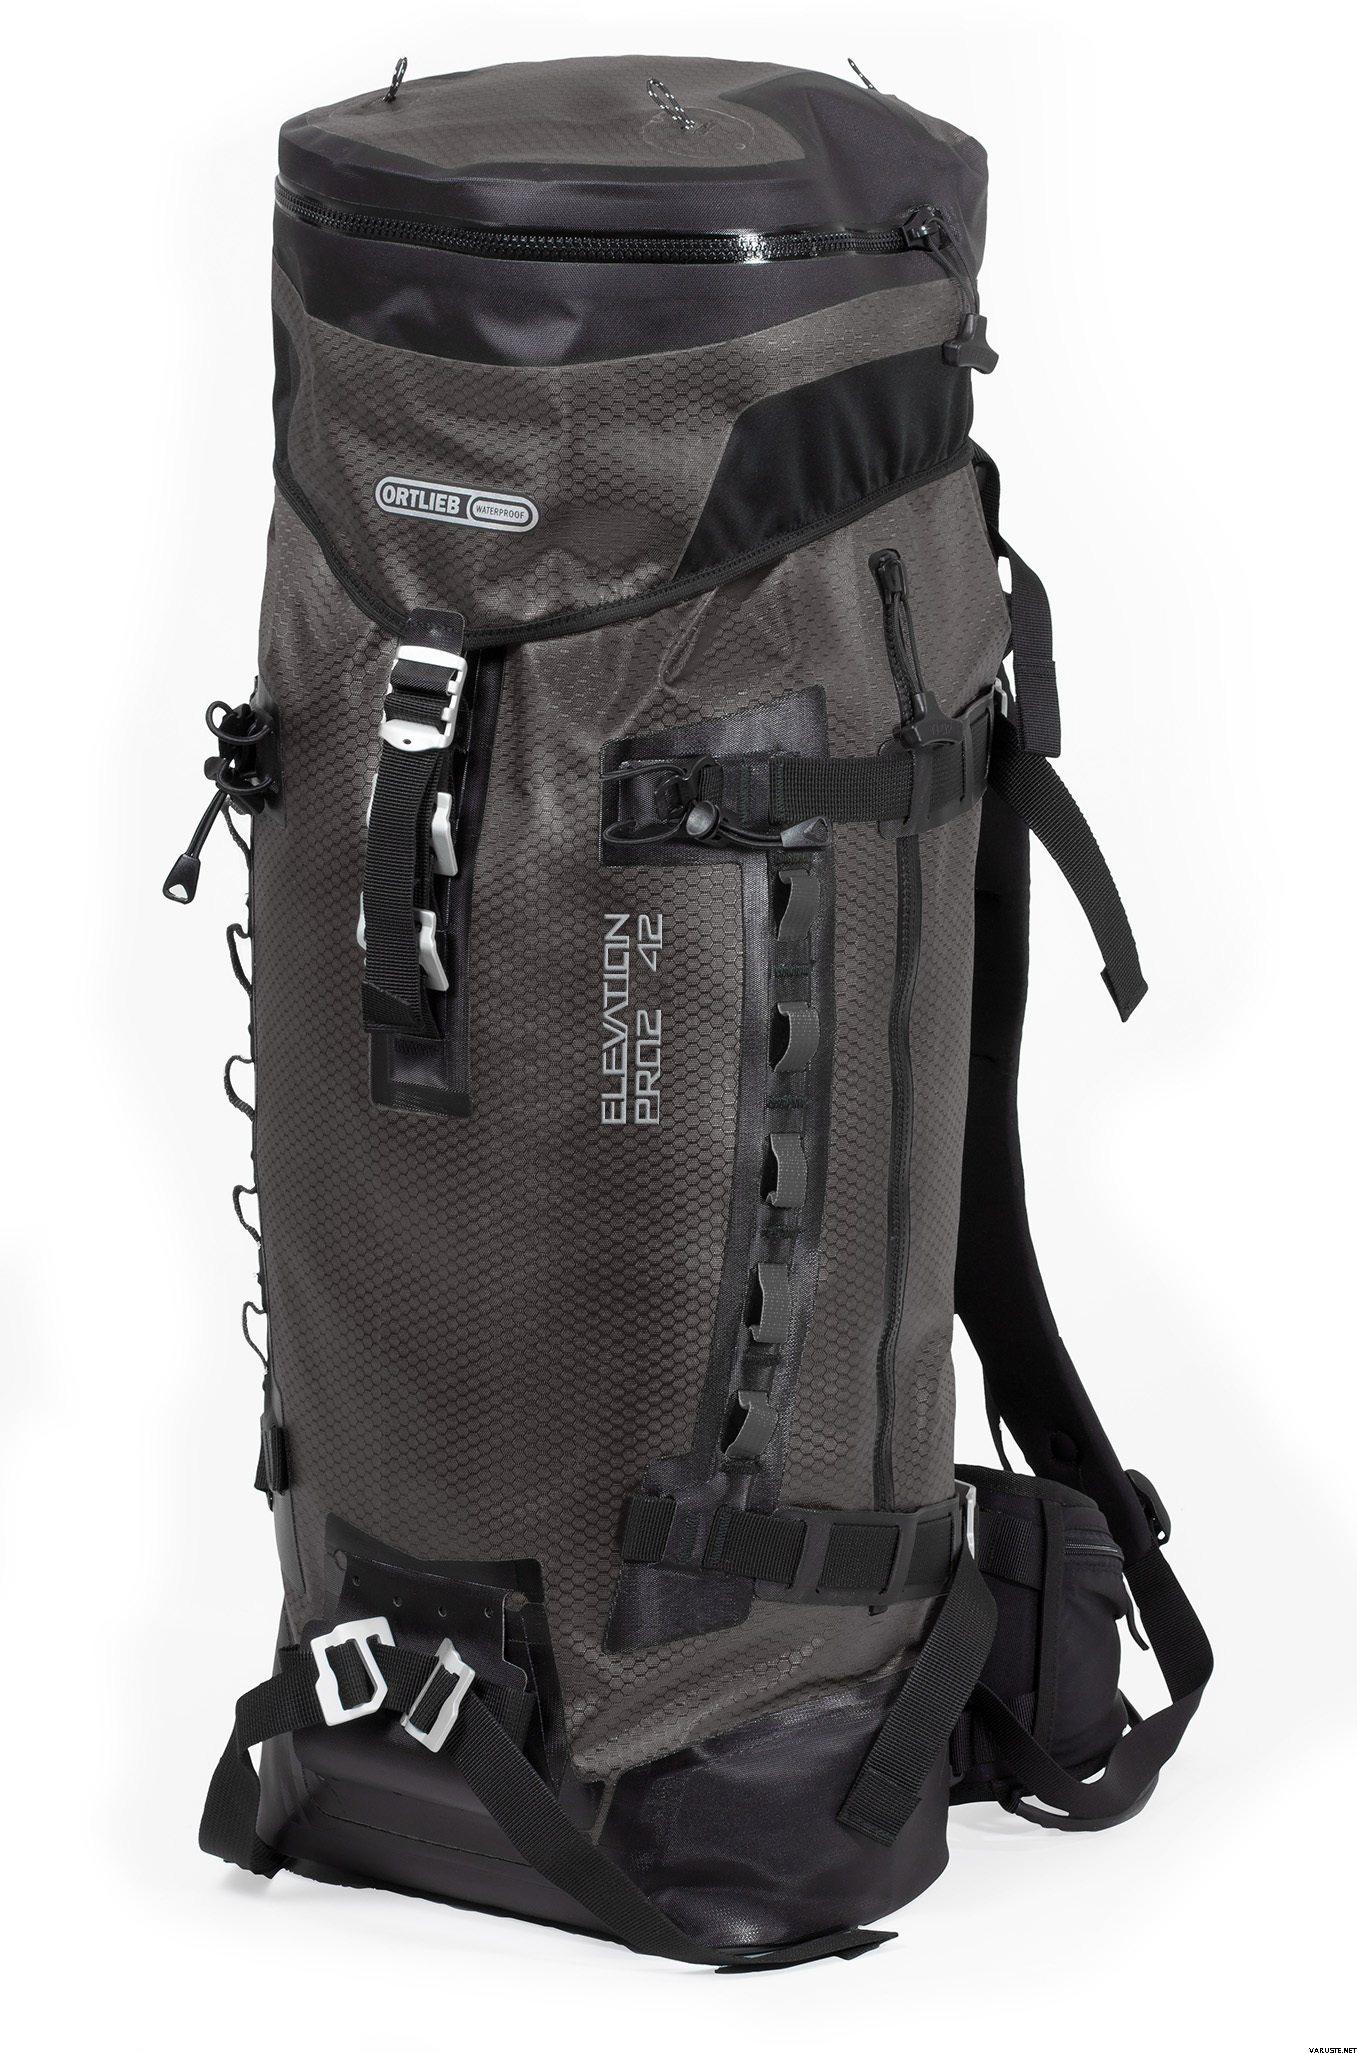 Ortlieb Elevation Pro 2 Climbing Backpacks Varuste Net